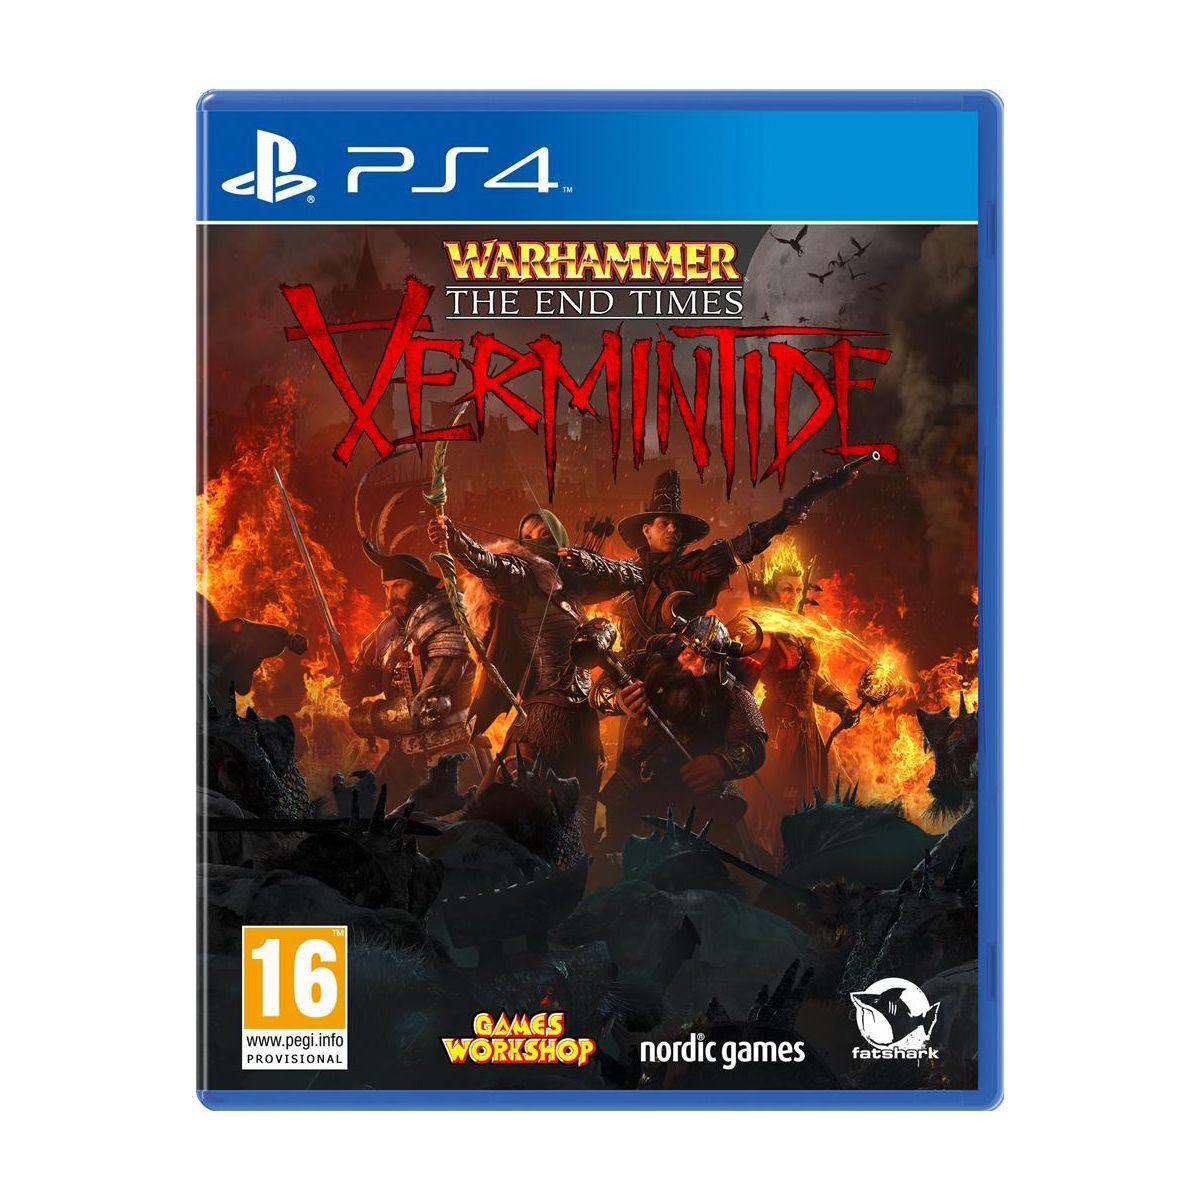 Jeu ps4 just for games warhammer the end - 3% de remise immédiate avec le code : multi3 (photo)